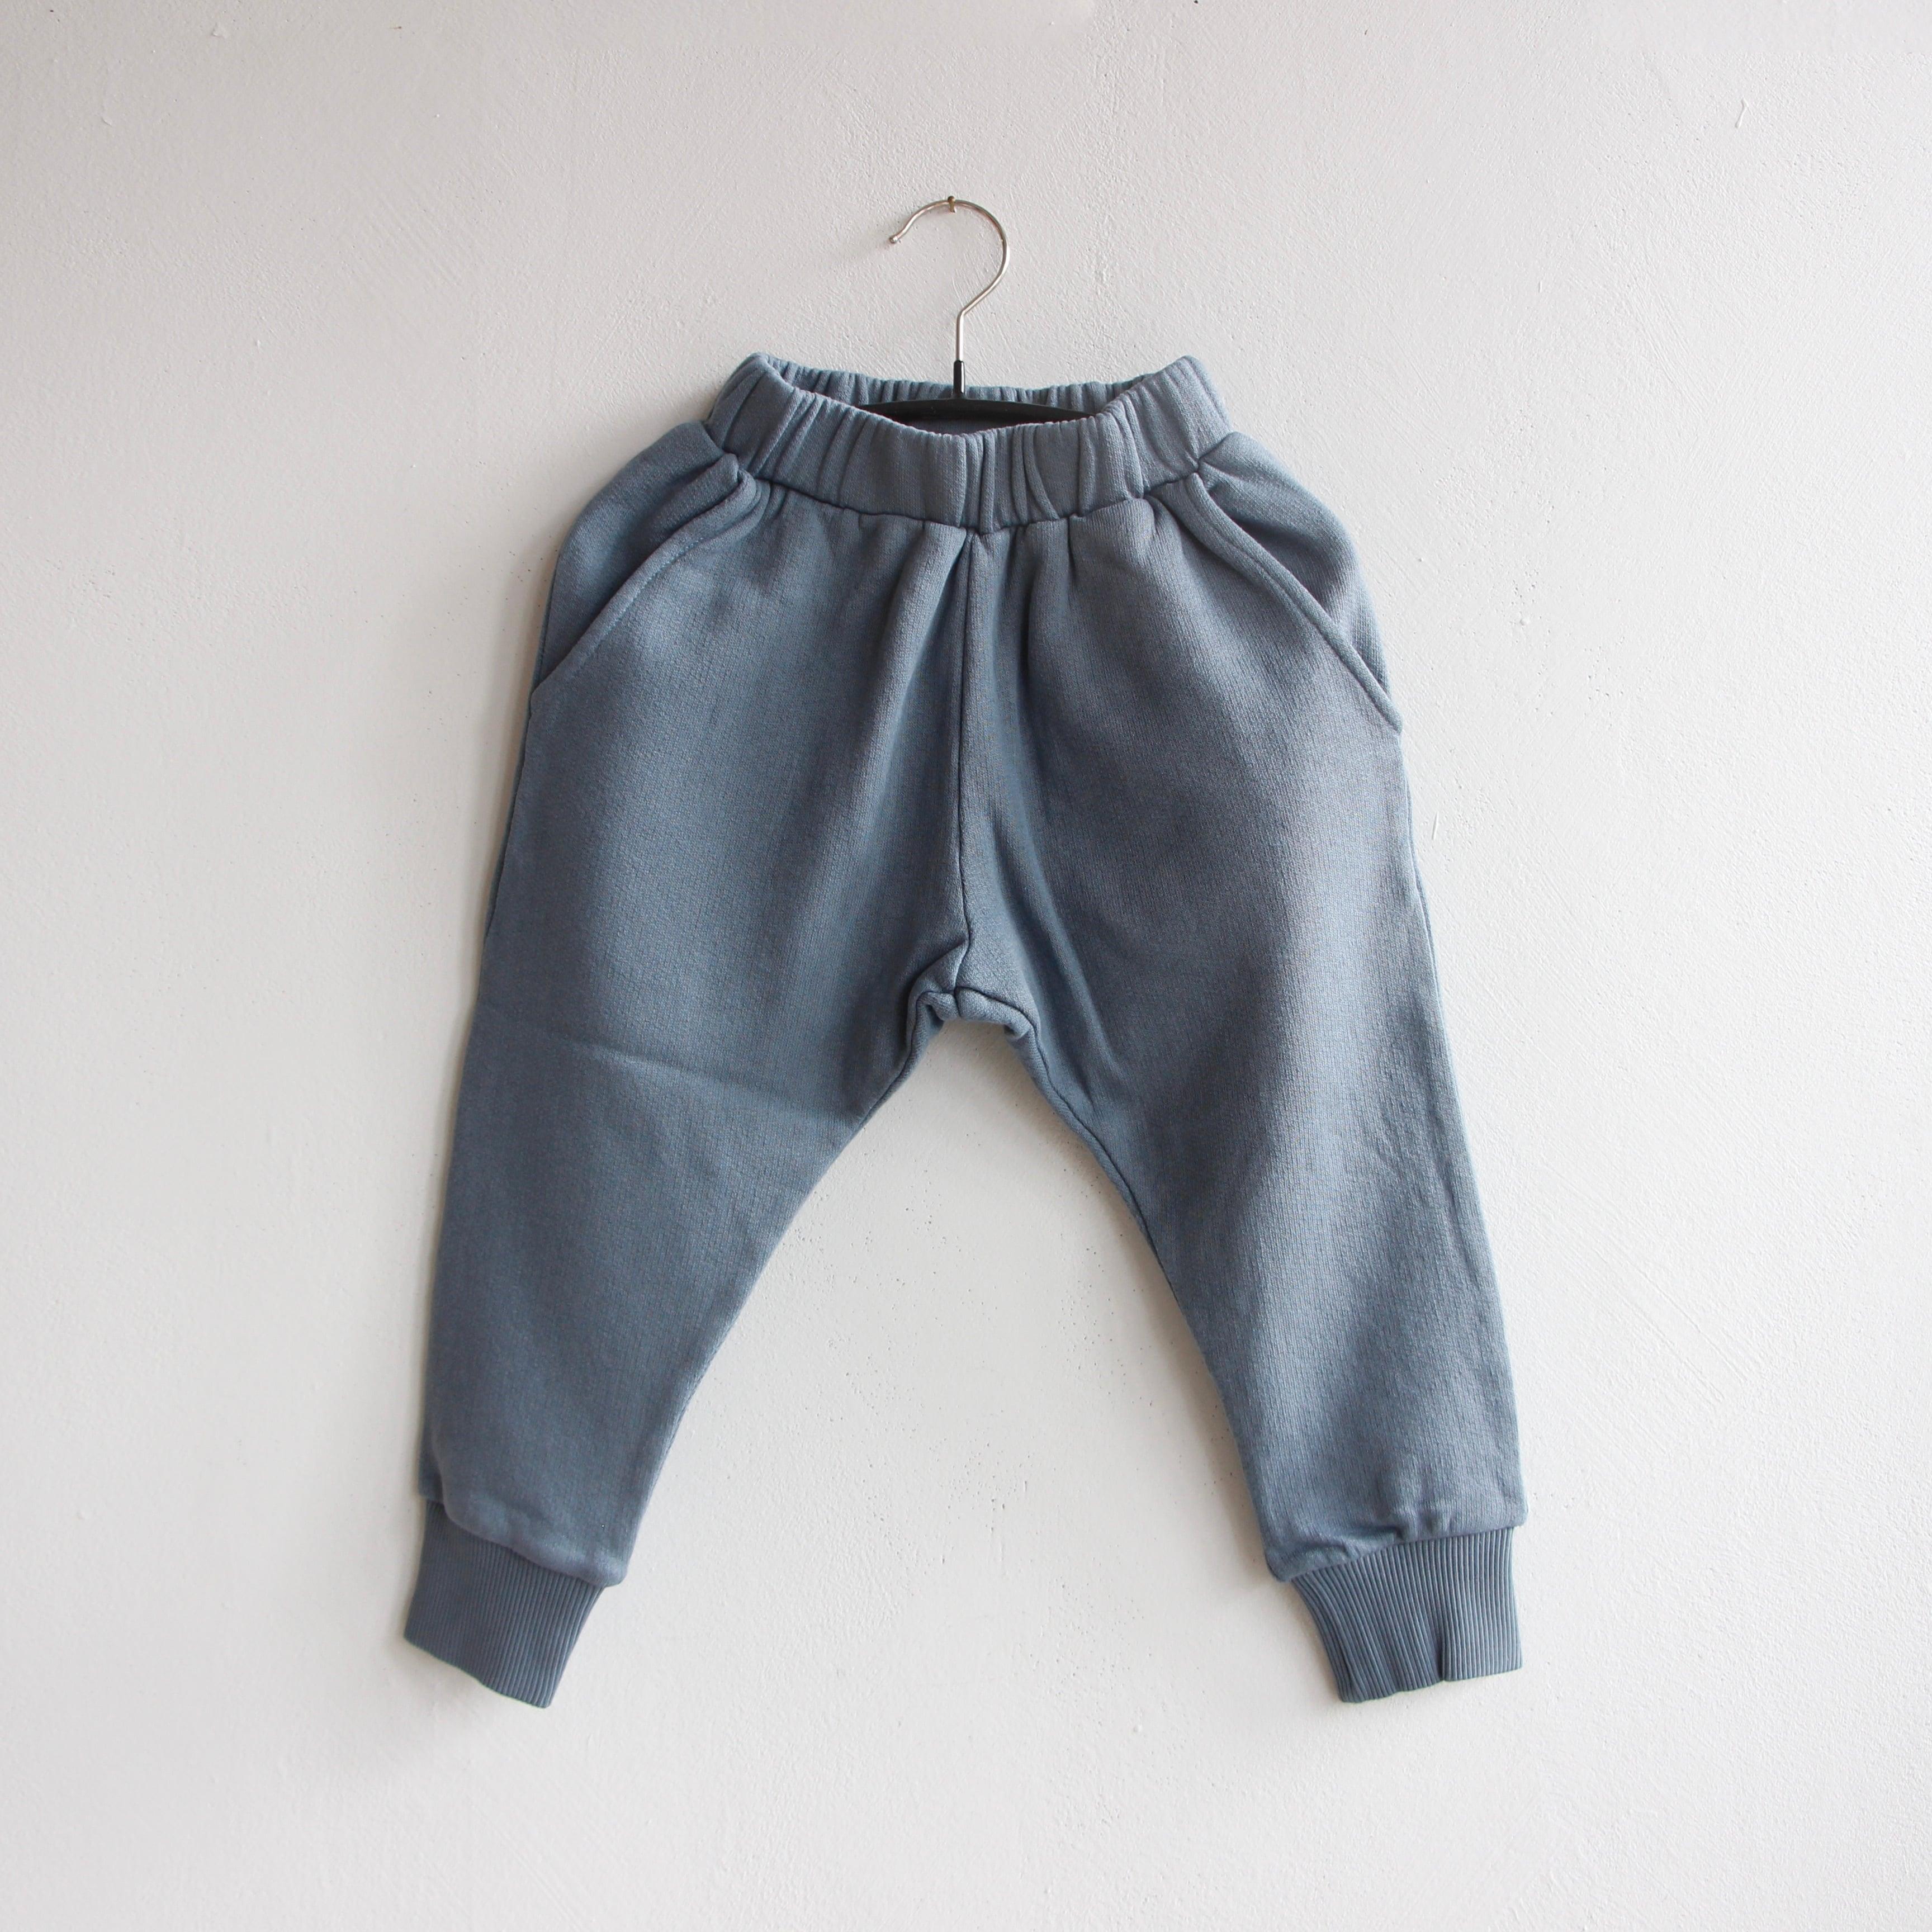 《WOLF & RITA 2021AW》AMADEU trousers / BLUE